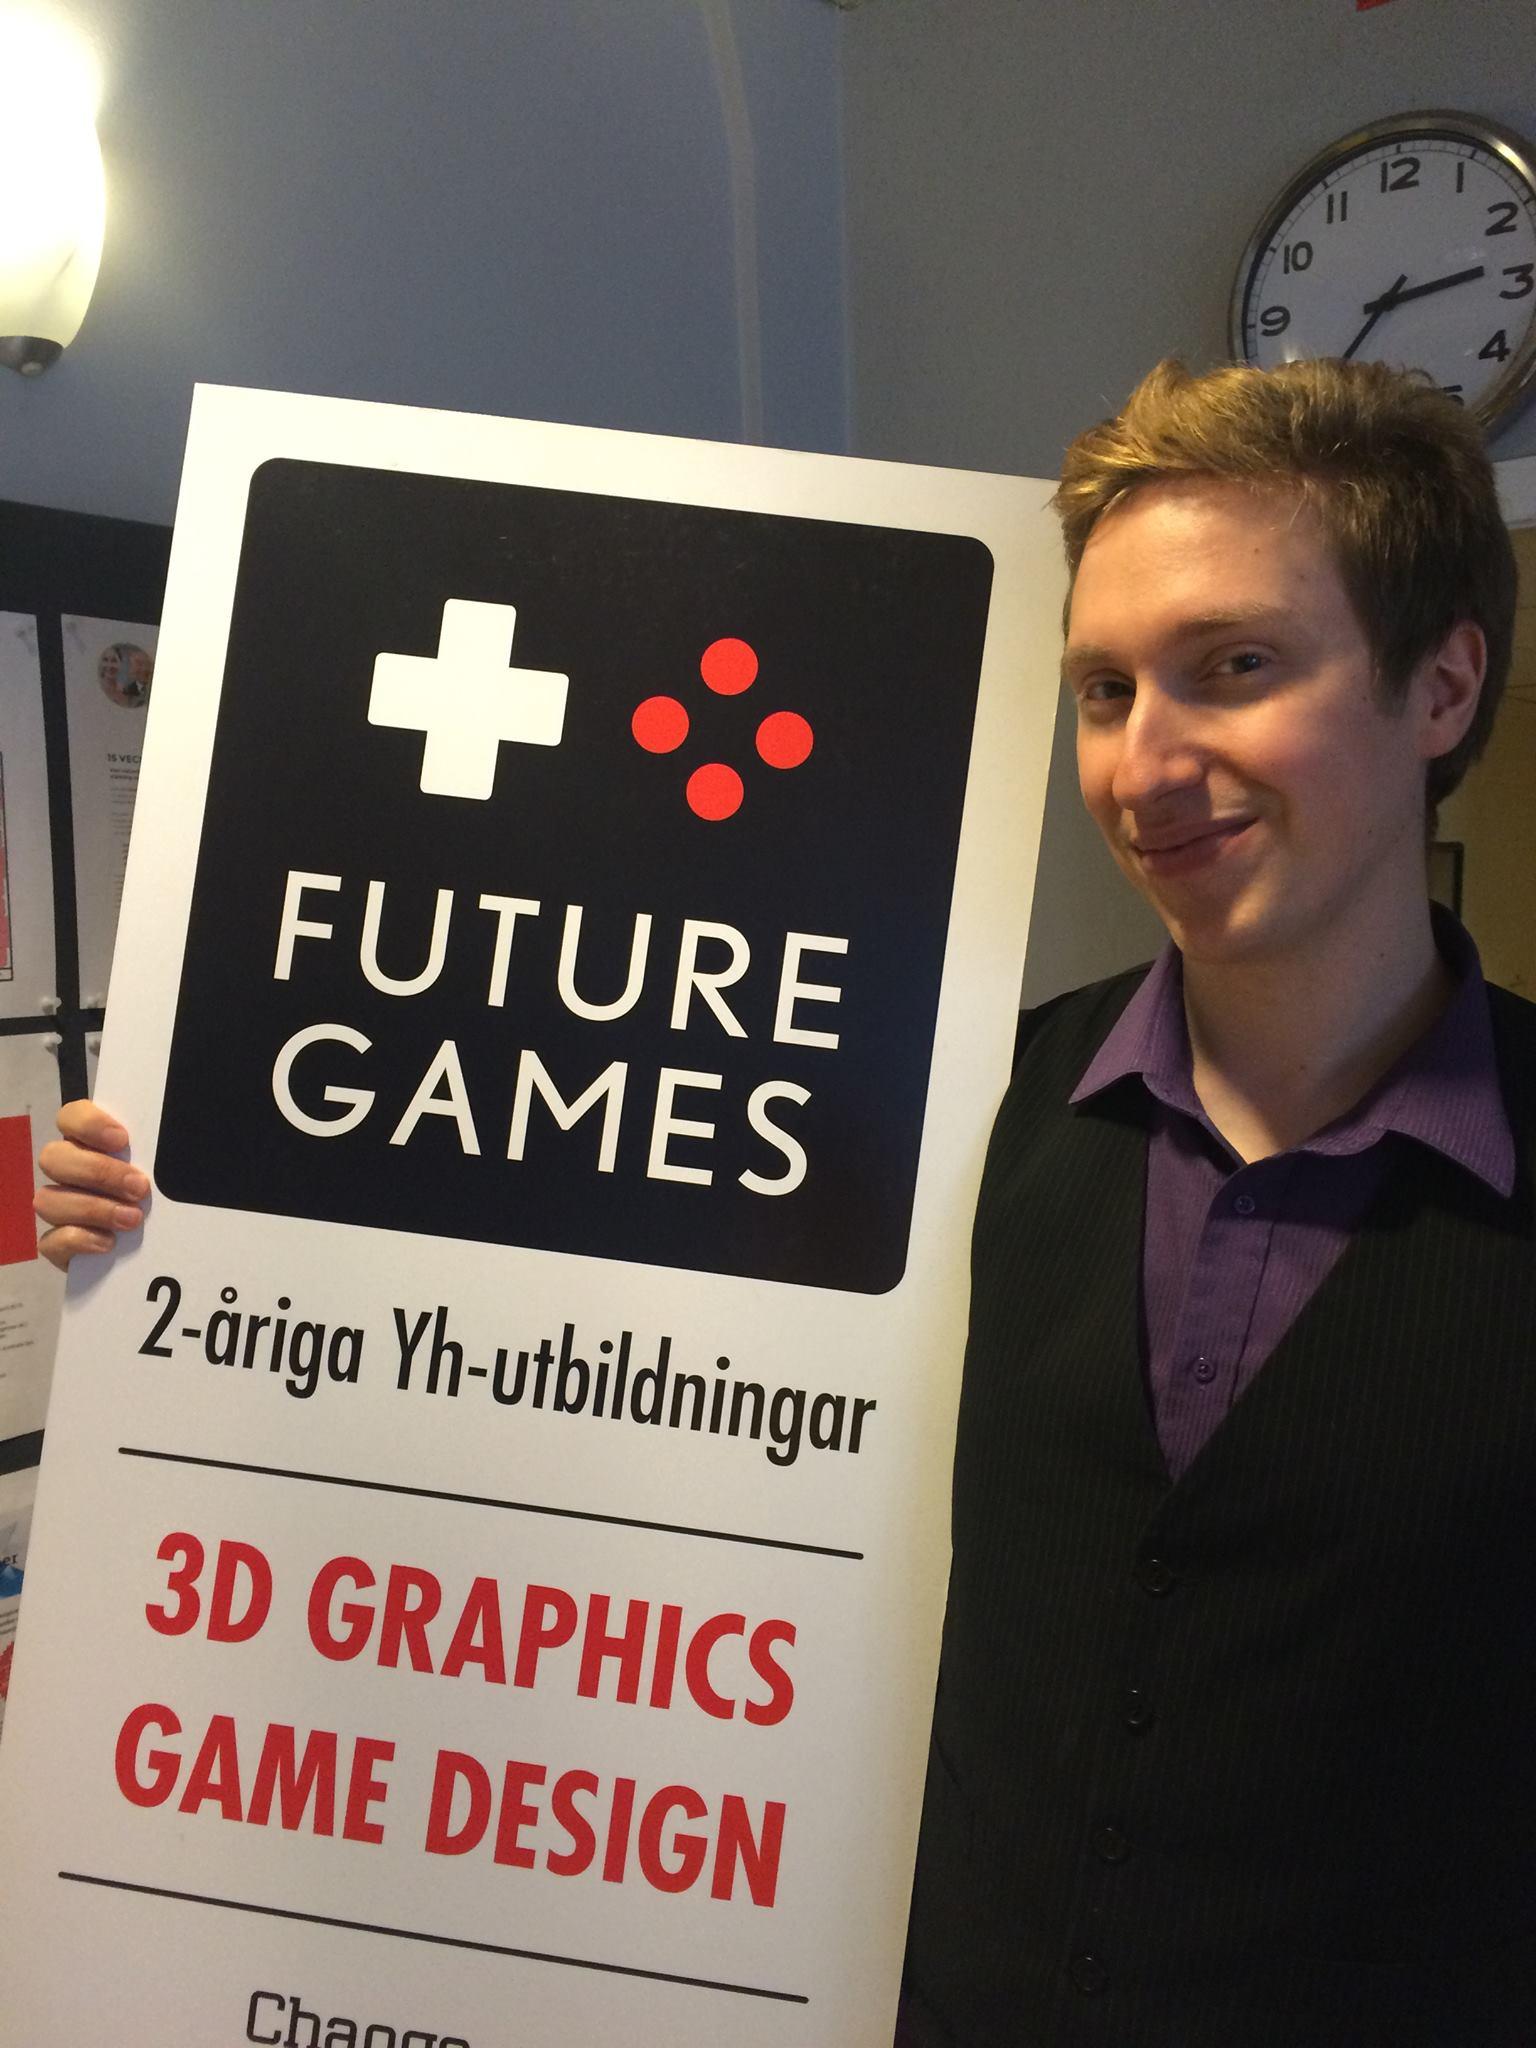 futuregames_fg15